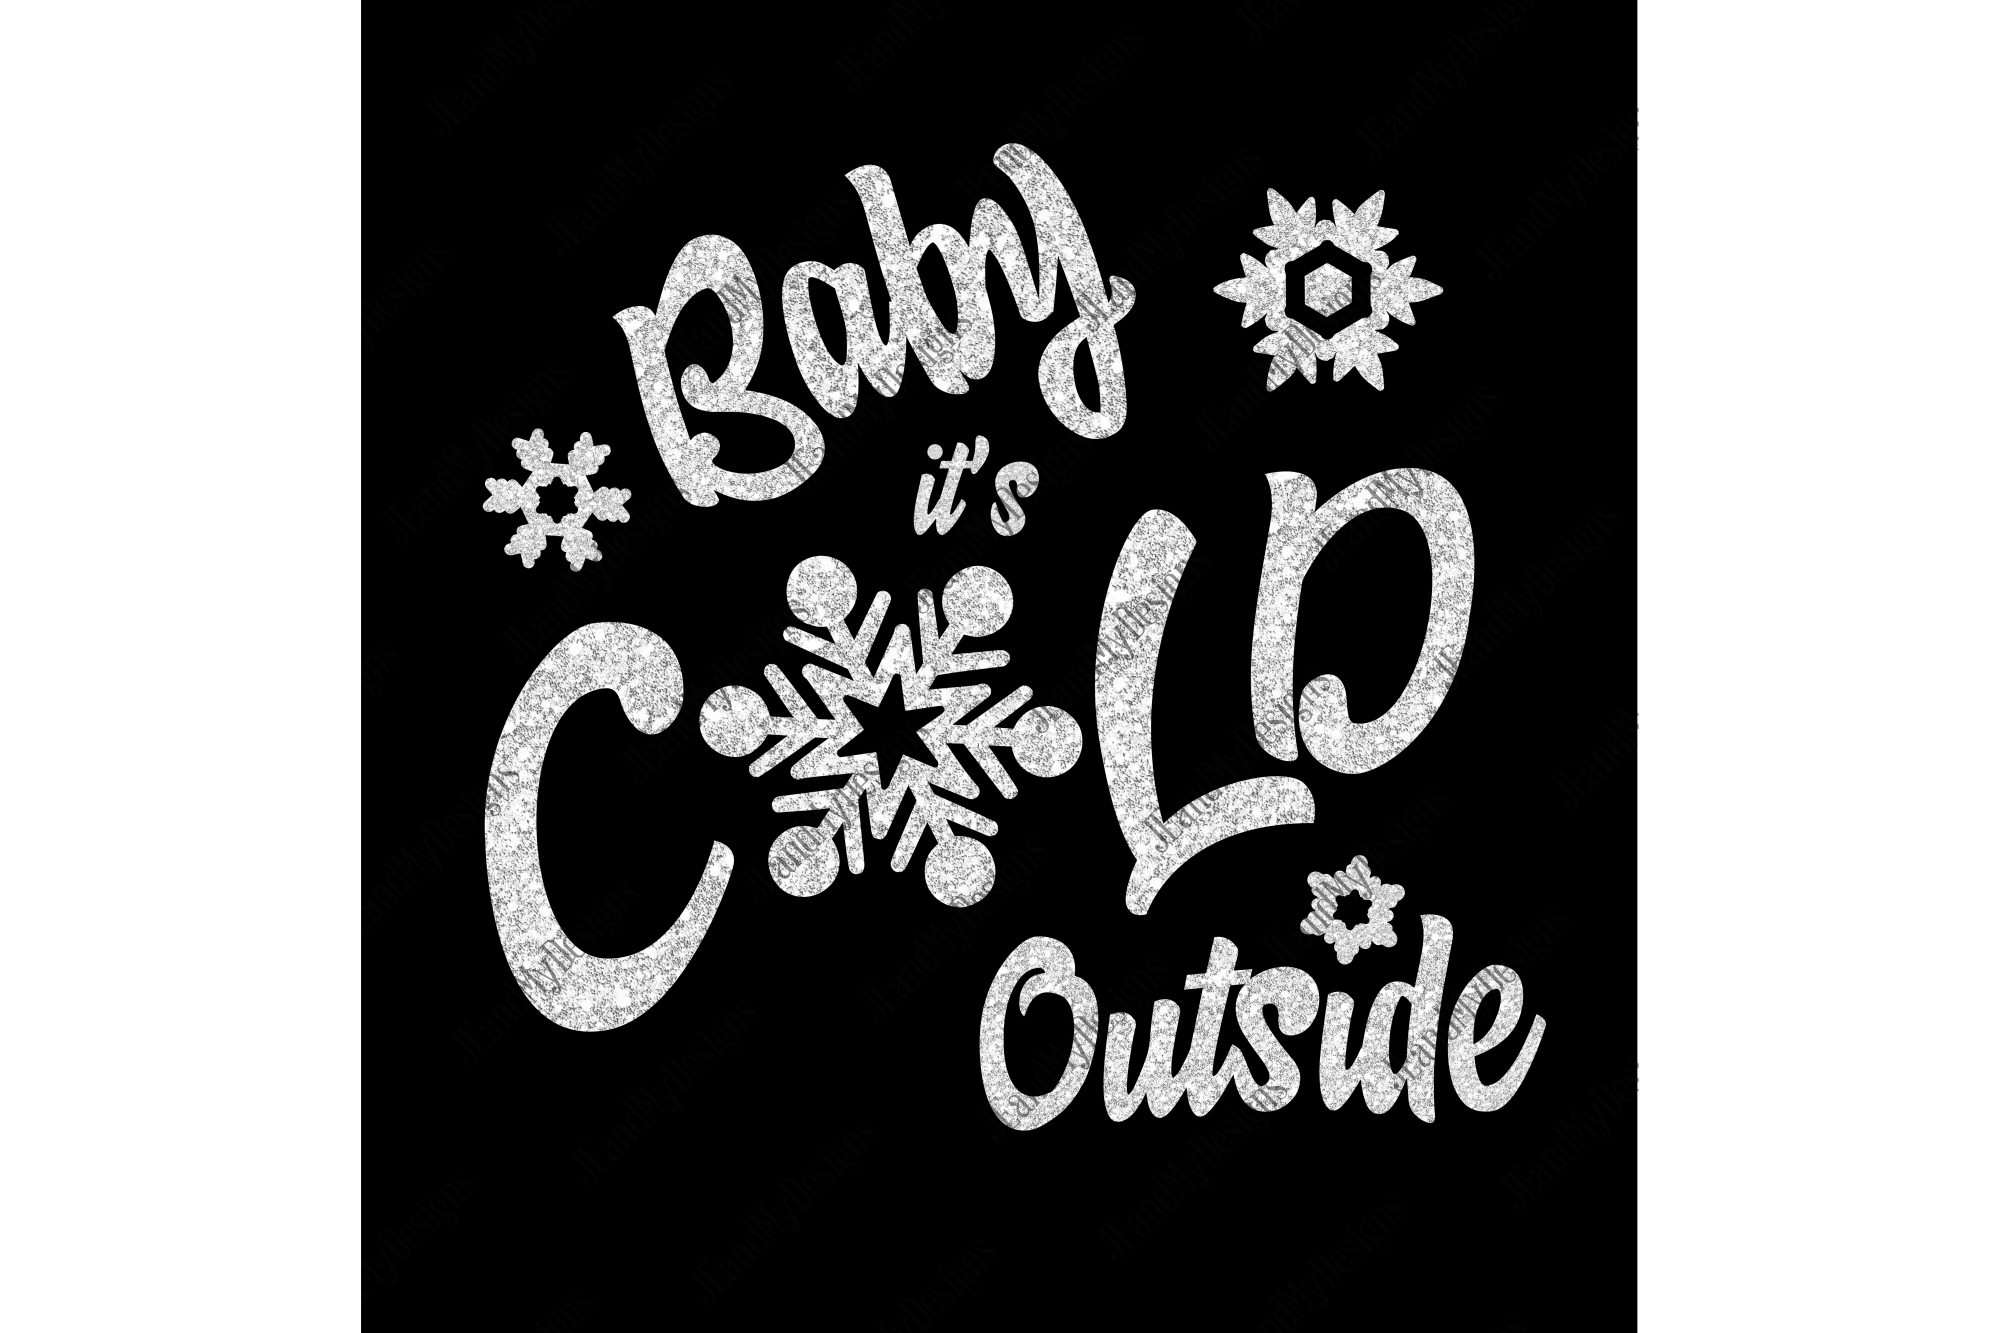 Baby It S Cold Outside Svg Jpeg Png Eps Dxf 10237 Svgs Design Bundles